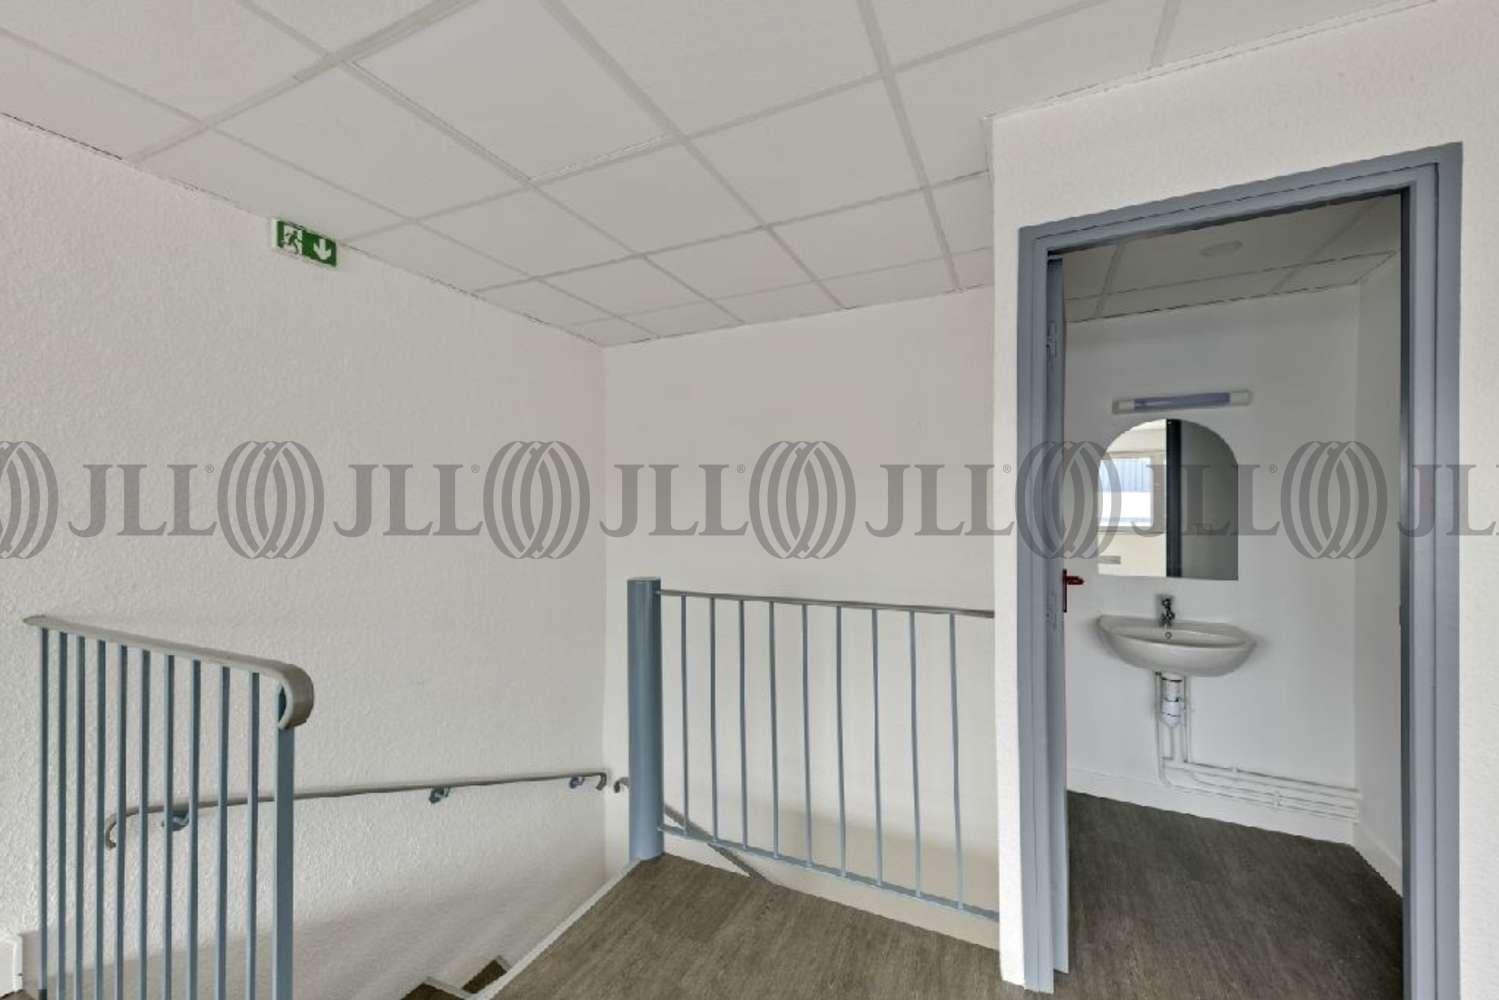 Activités/entrepôt Chilly mazarin, 91380 - IDF SUD / POLE D'ORLY - 9586540